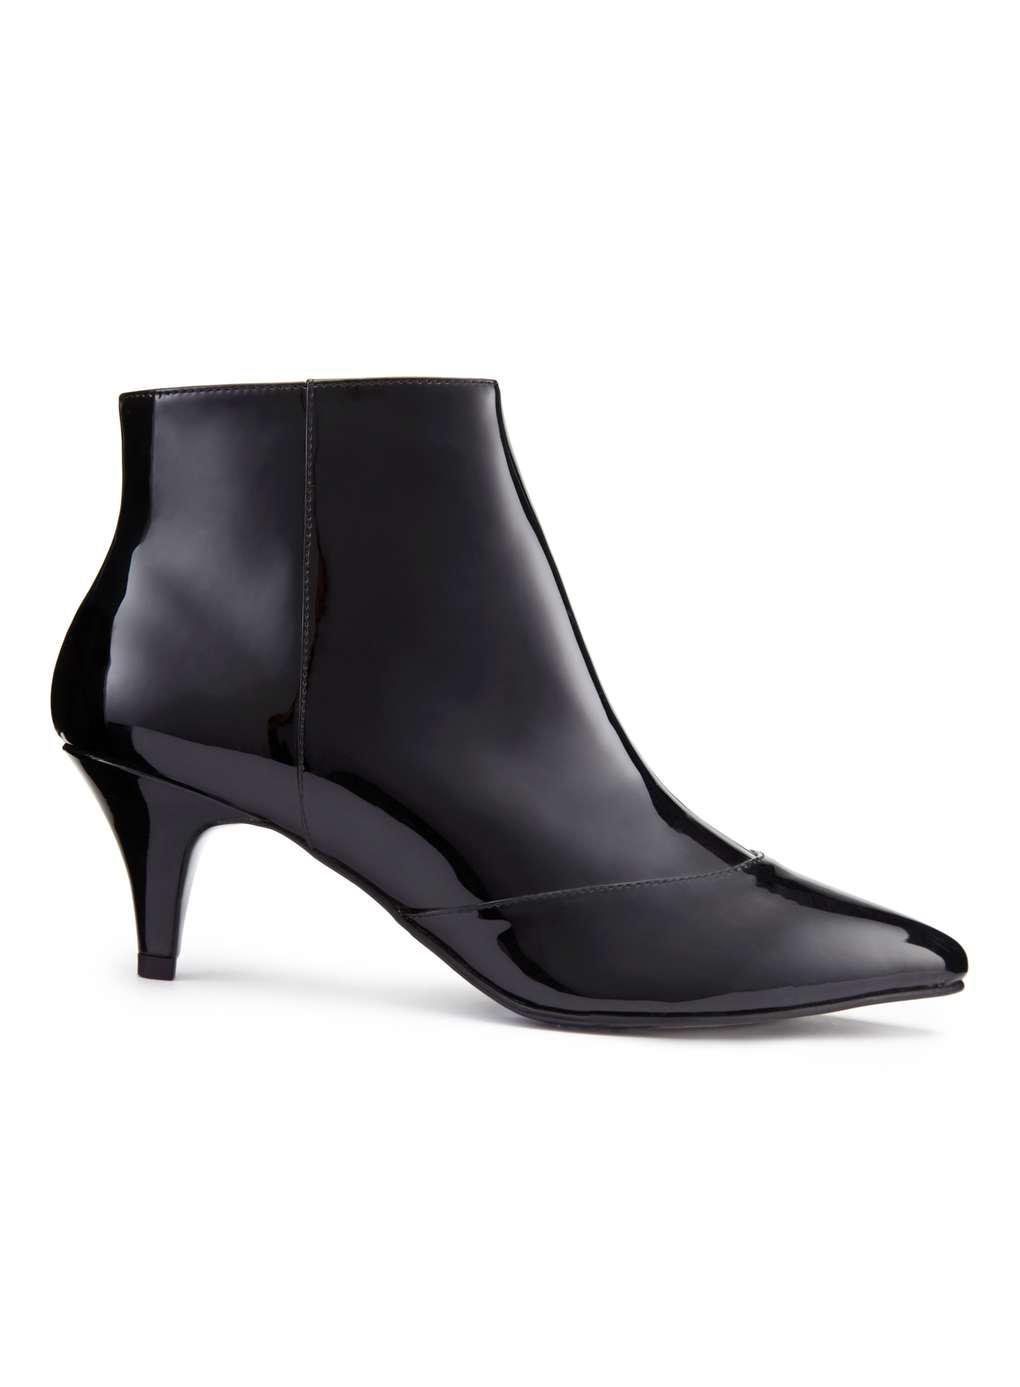 Miss Selfridge Dita Patent Kitten Heel Boots in Black